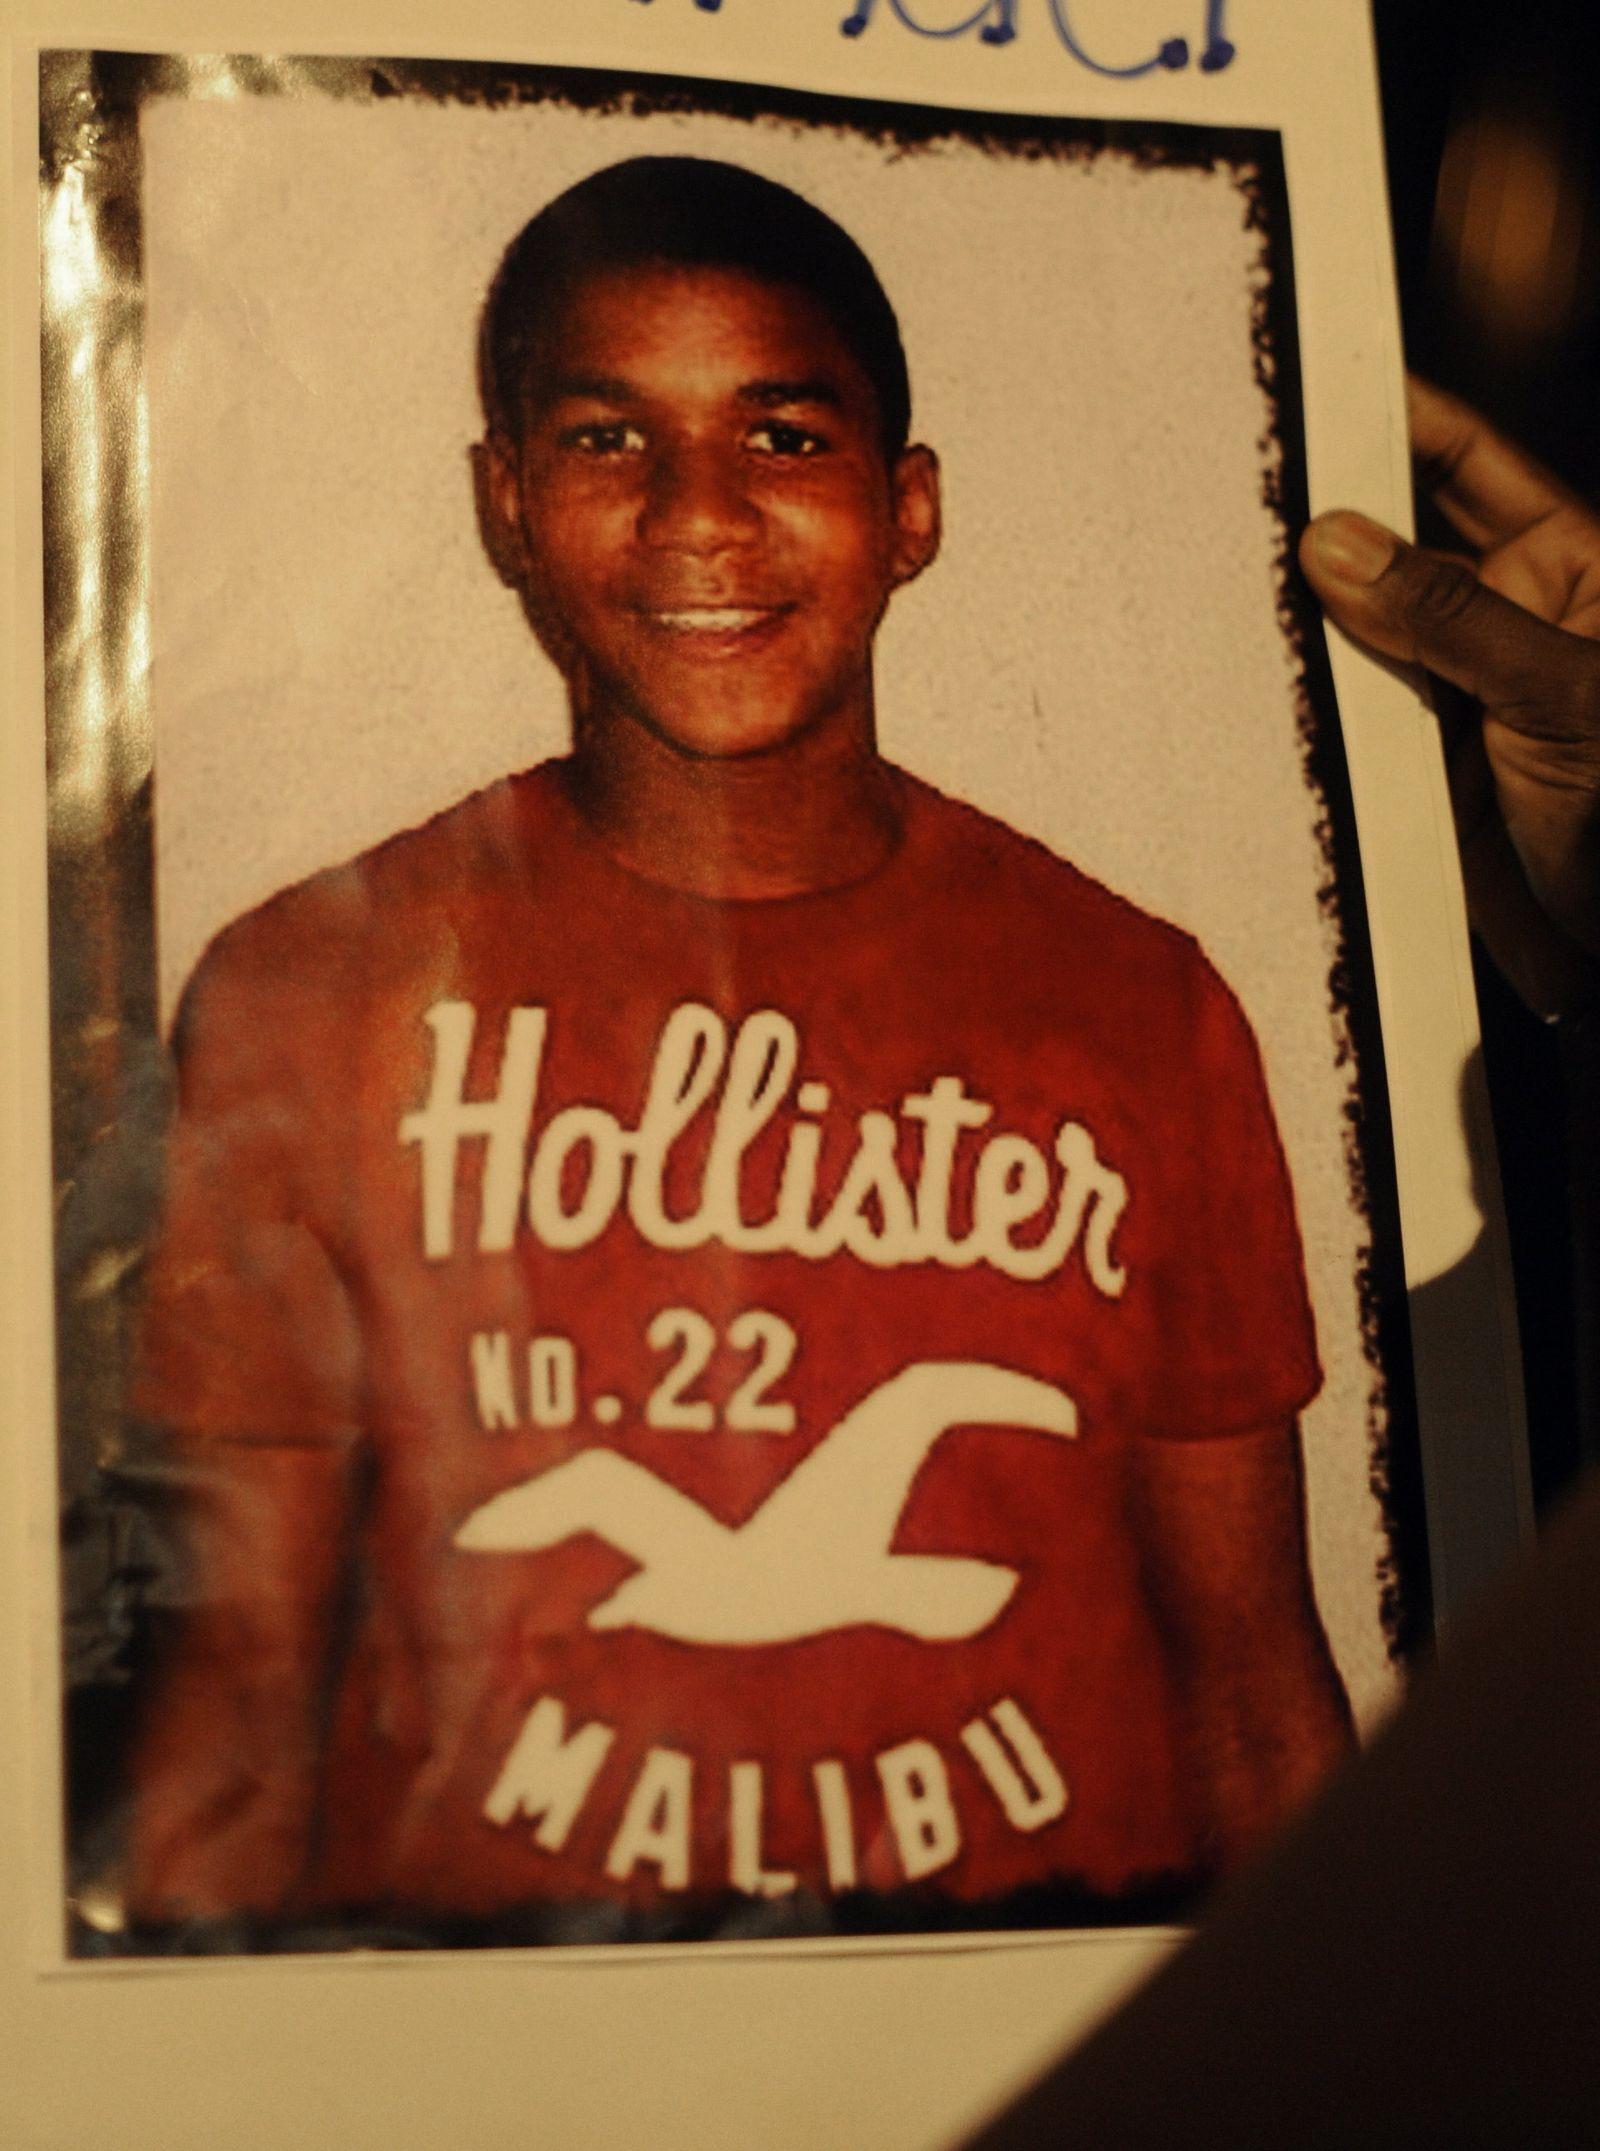 Tod von Trayvon Martin / Proteste